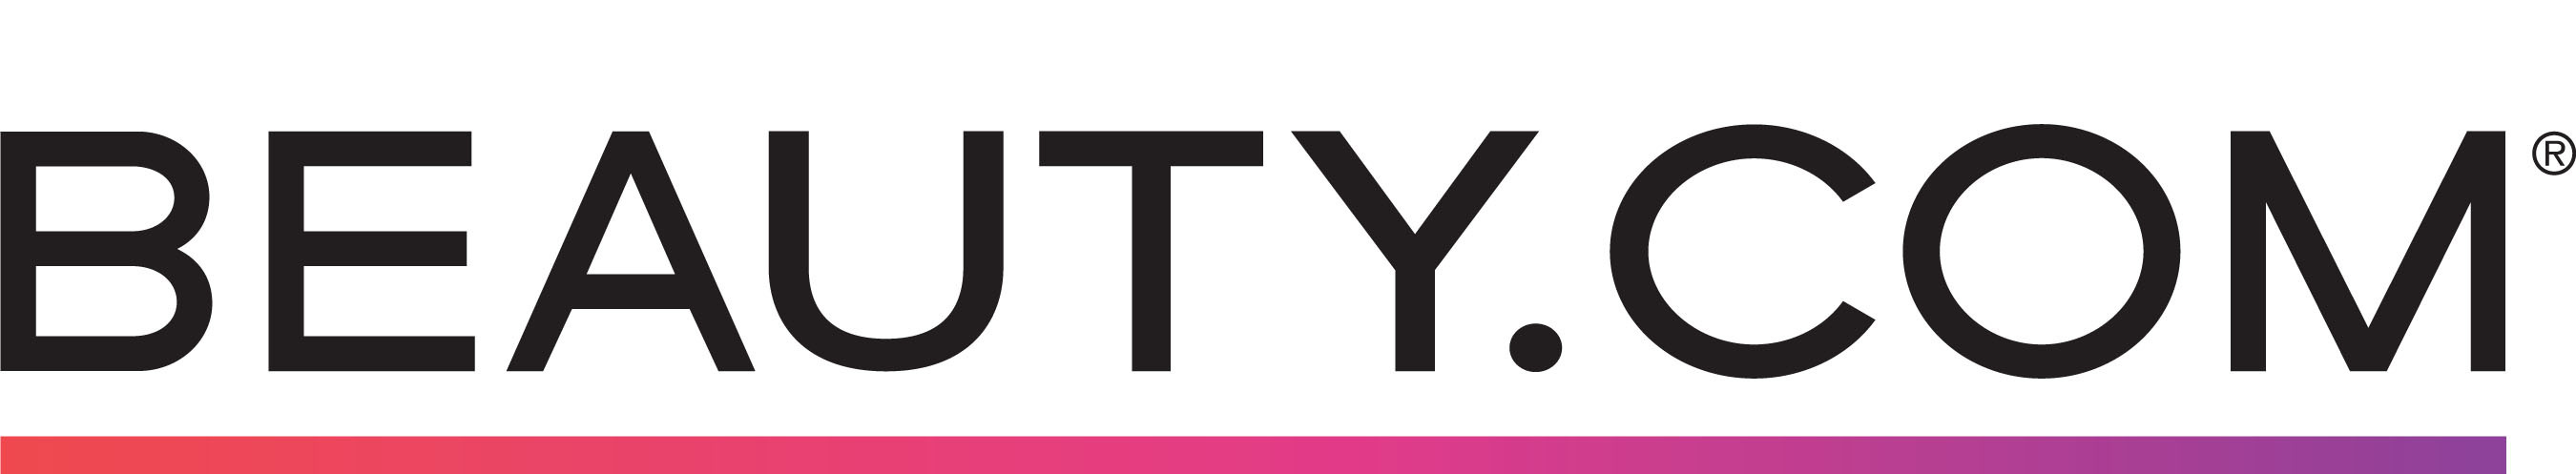 Beauty.com logo.